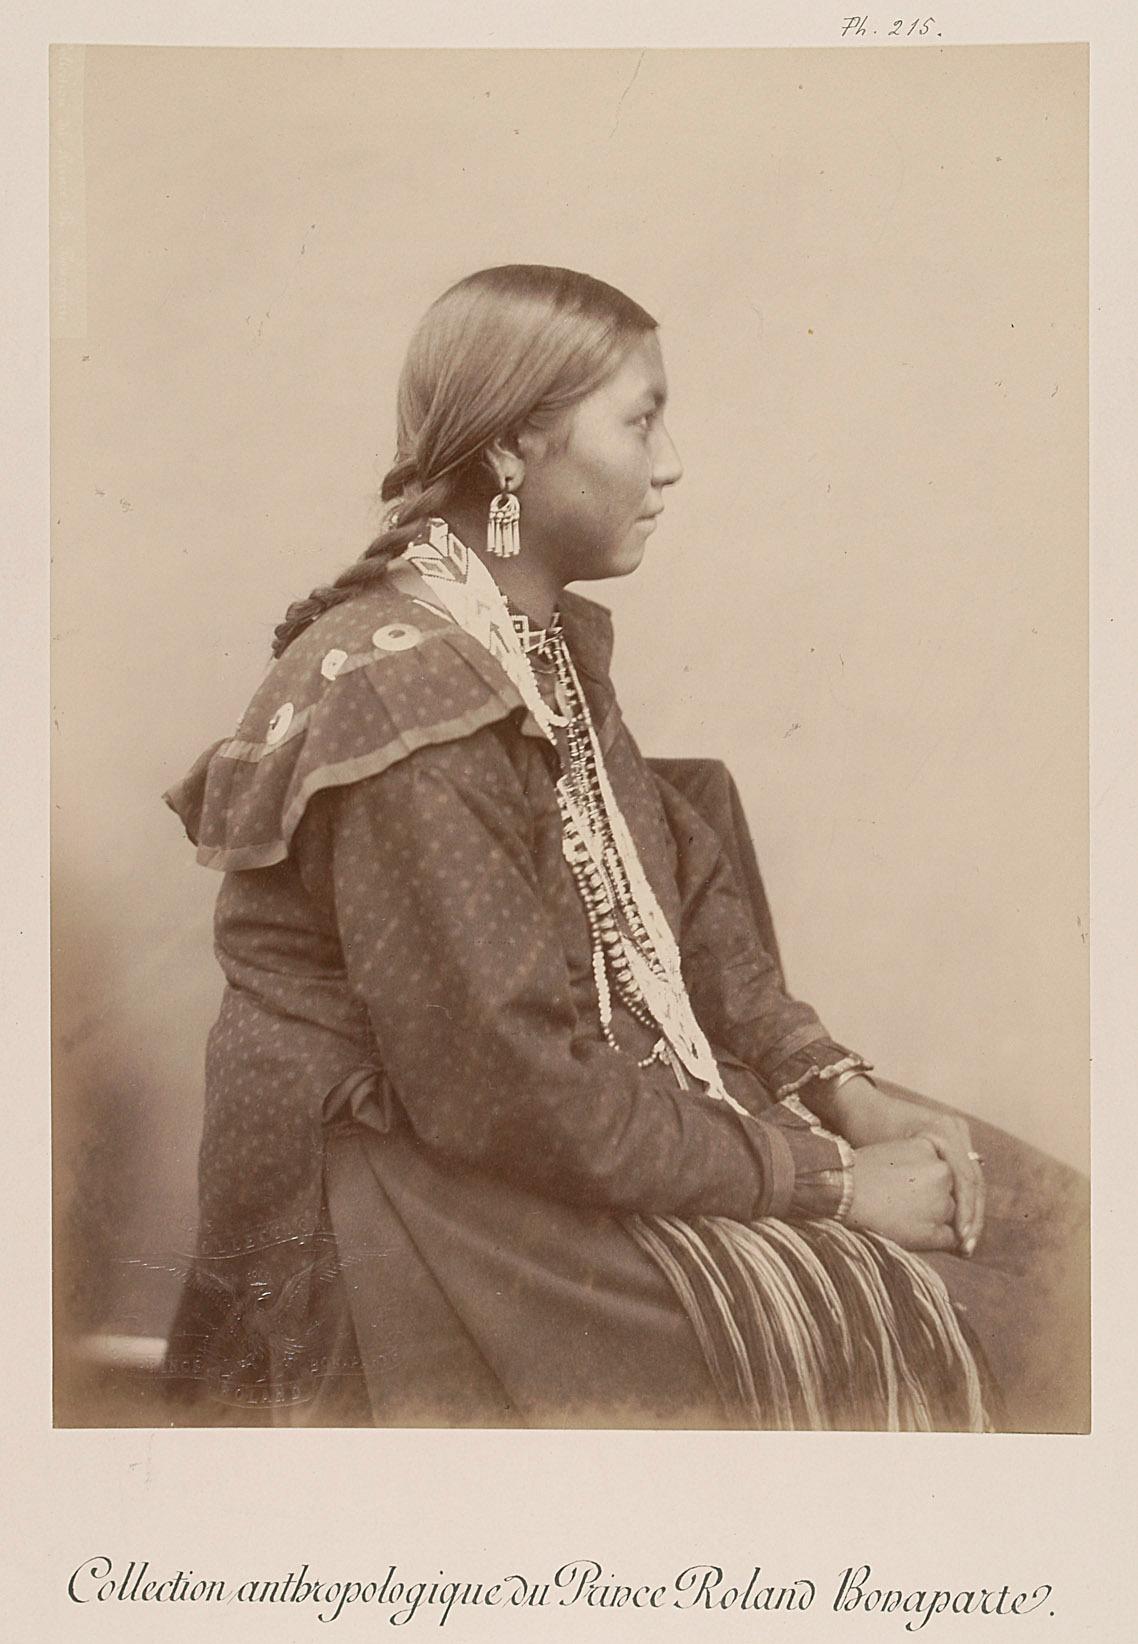 Mnigh-di-tai, junge Frau, Profilansicht von Prinz Roland Napoléon Bonaparte